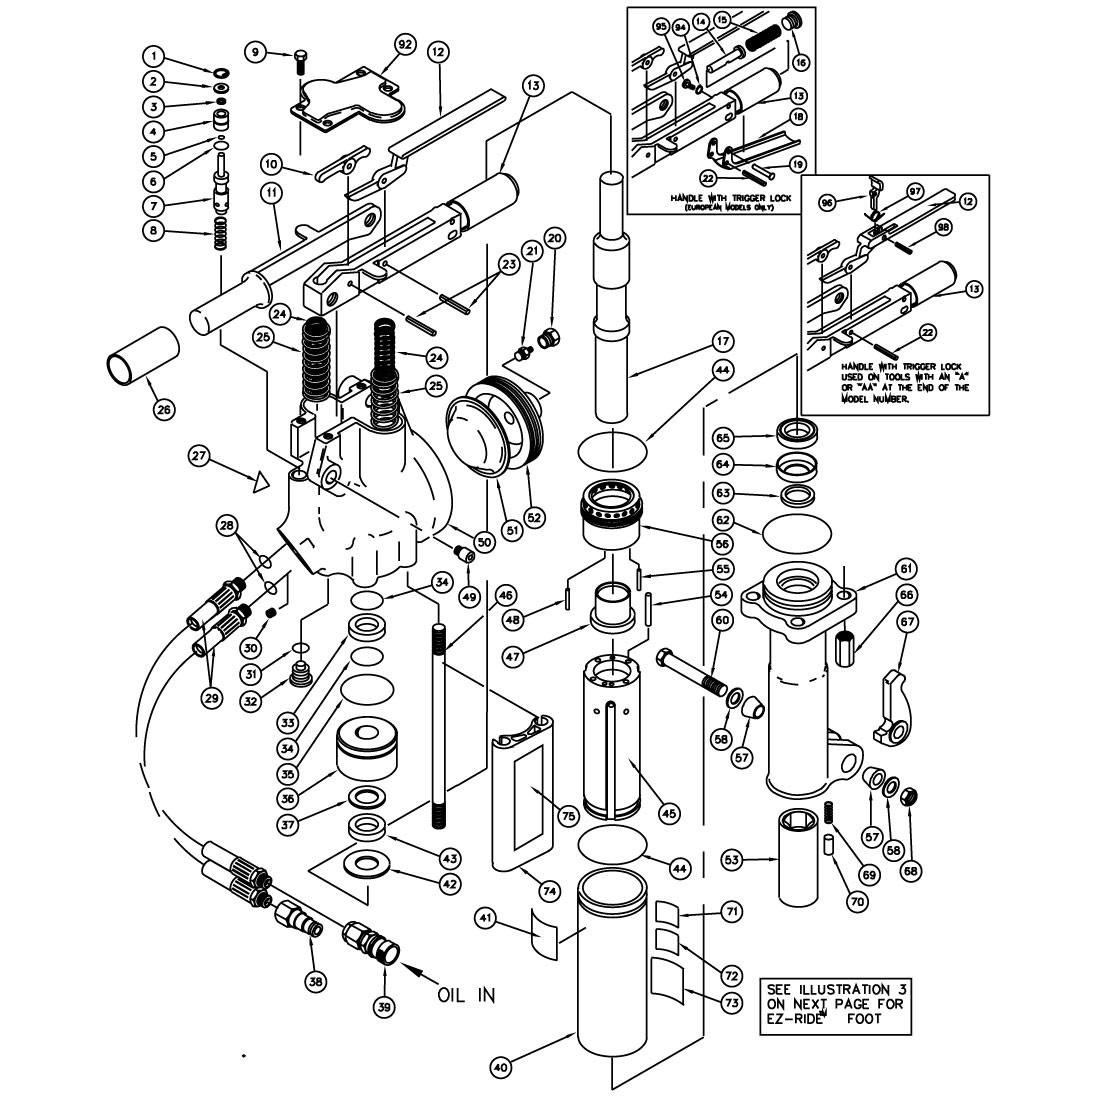 Stanley BR67 Anti-Vibration Handle Parts Illustration